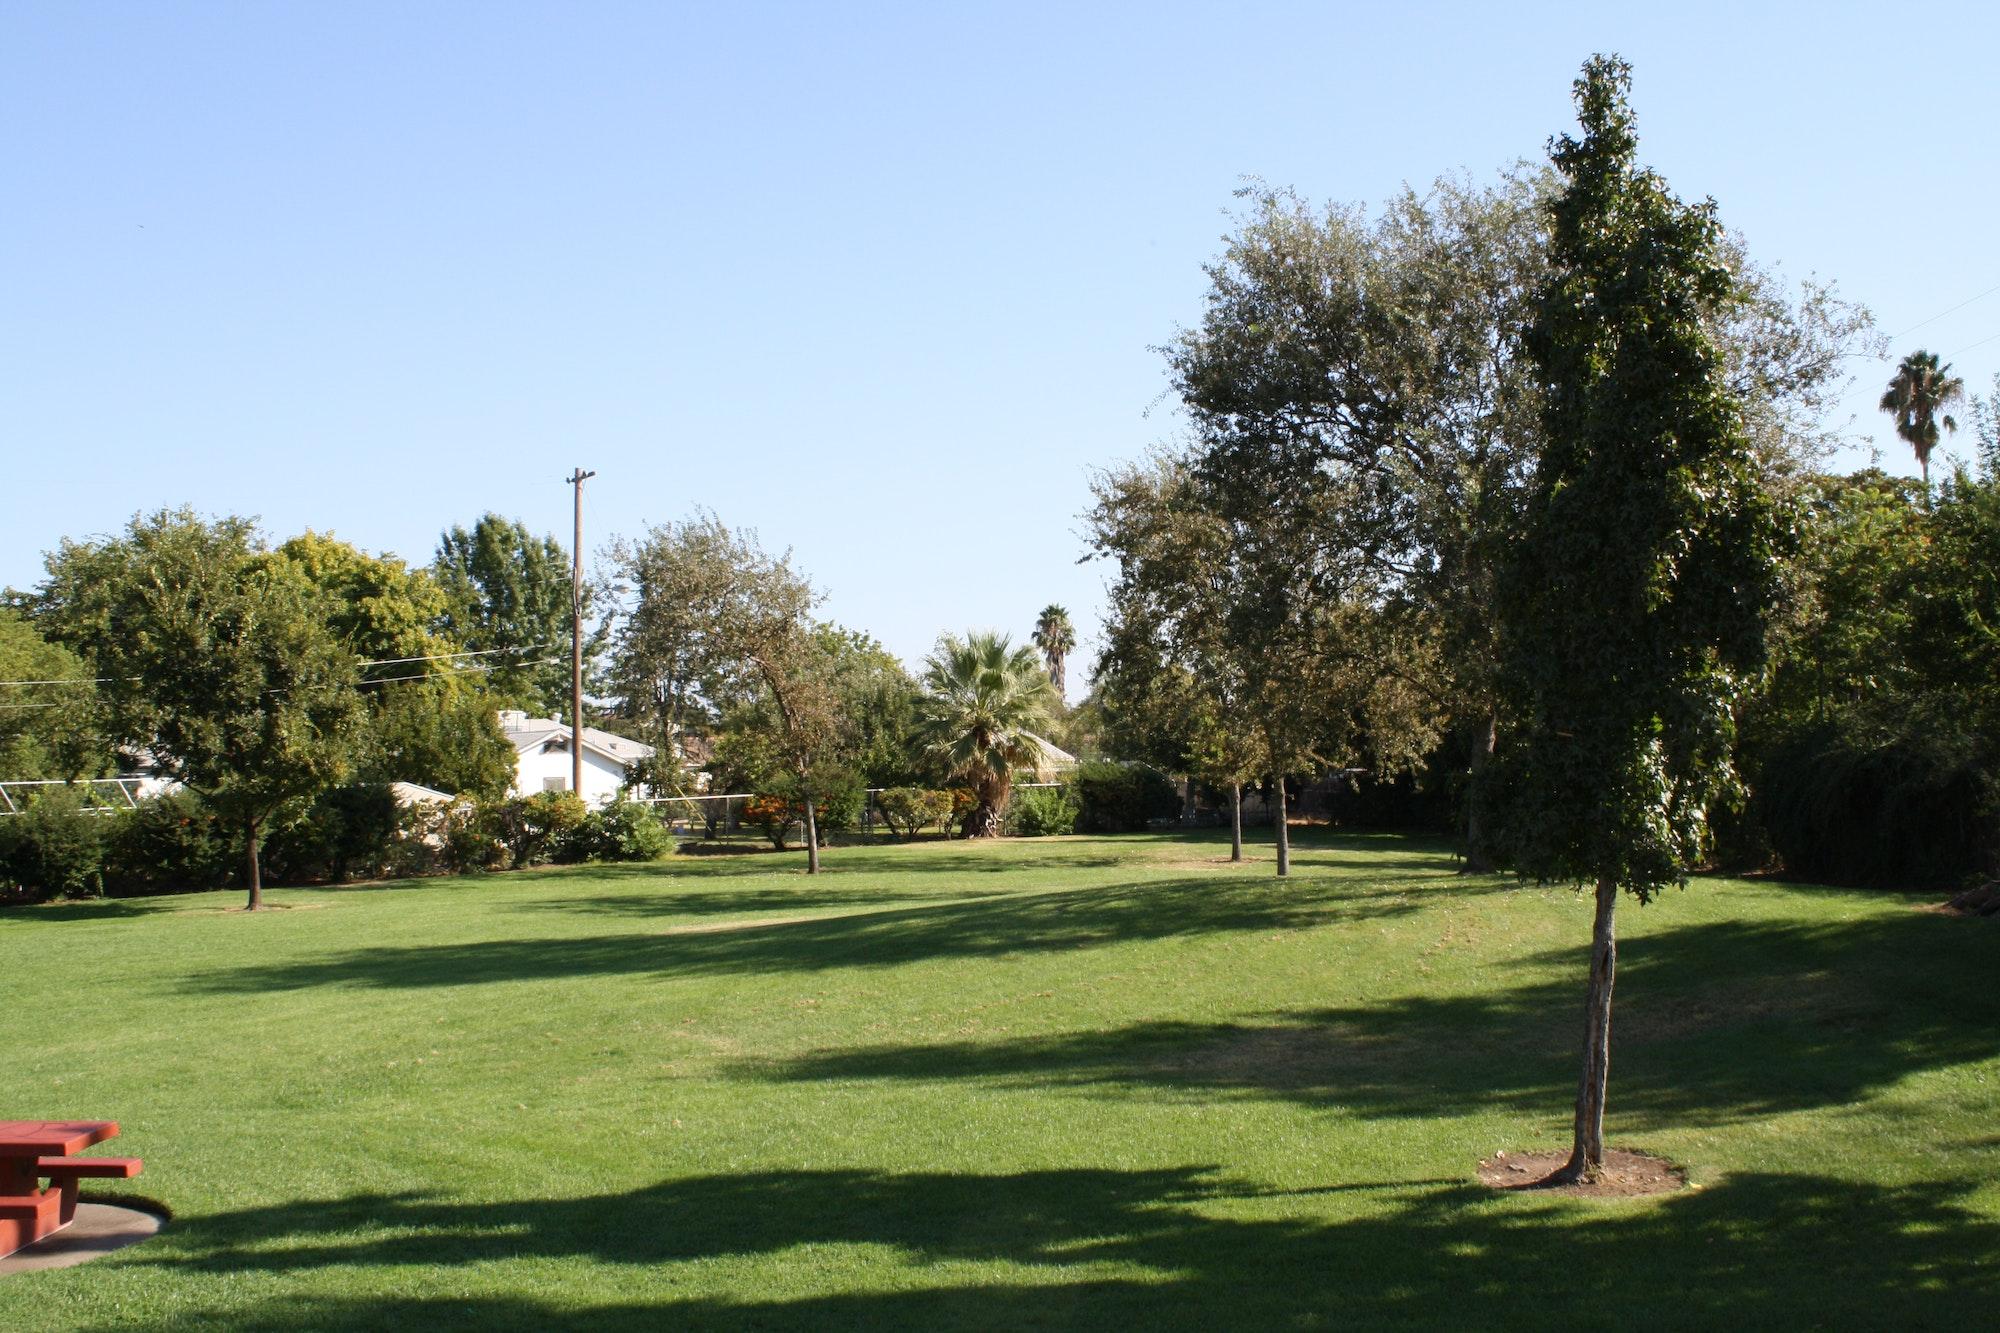 Planehaven Park open grass space